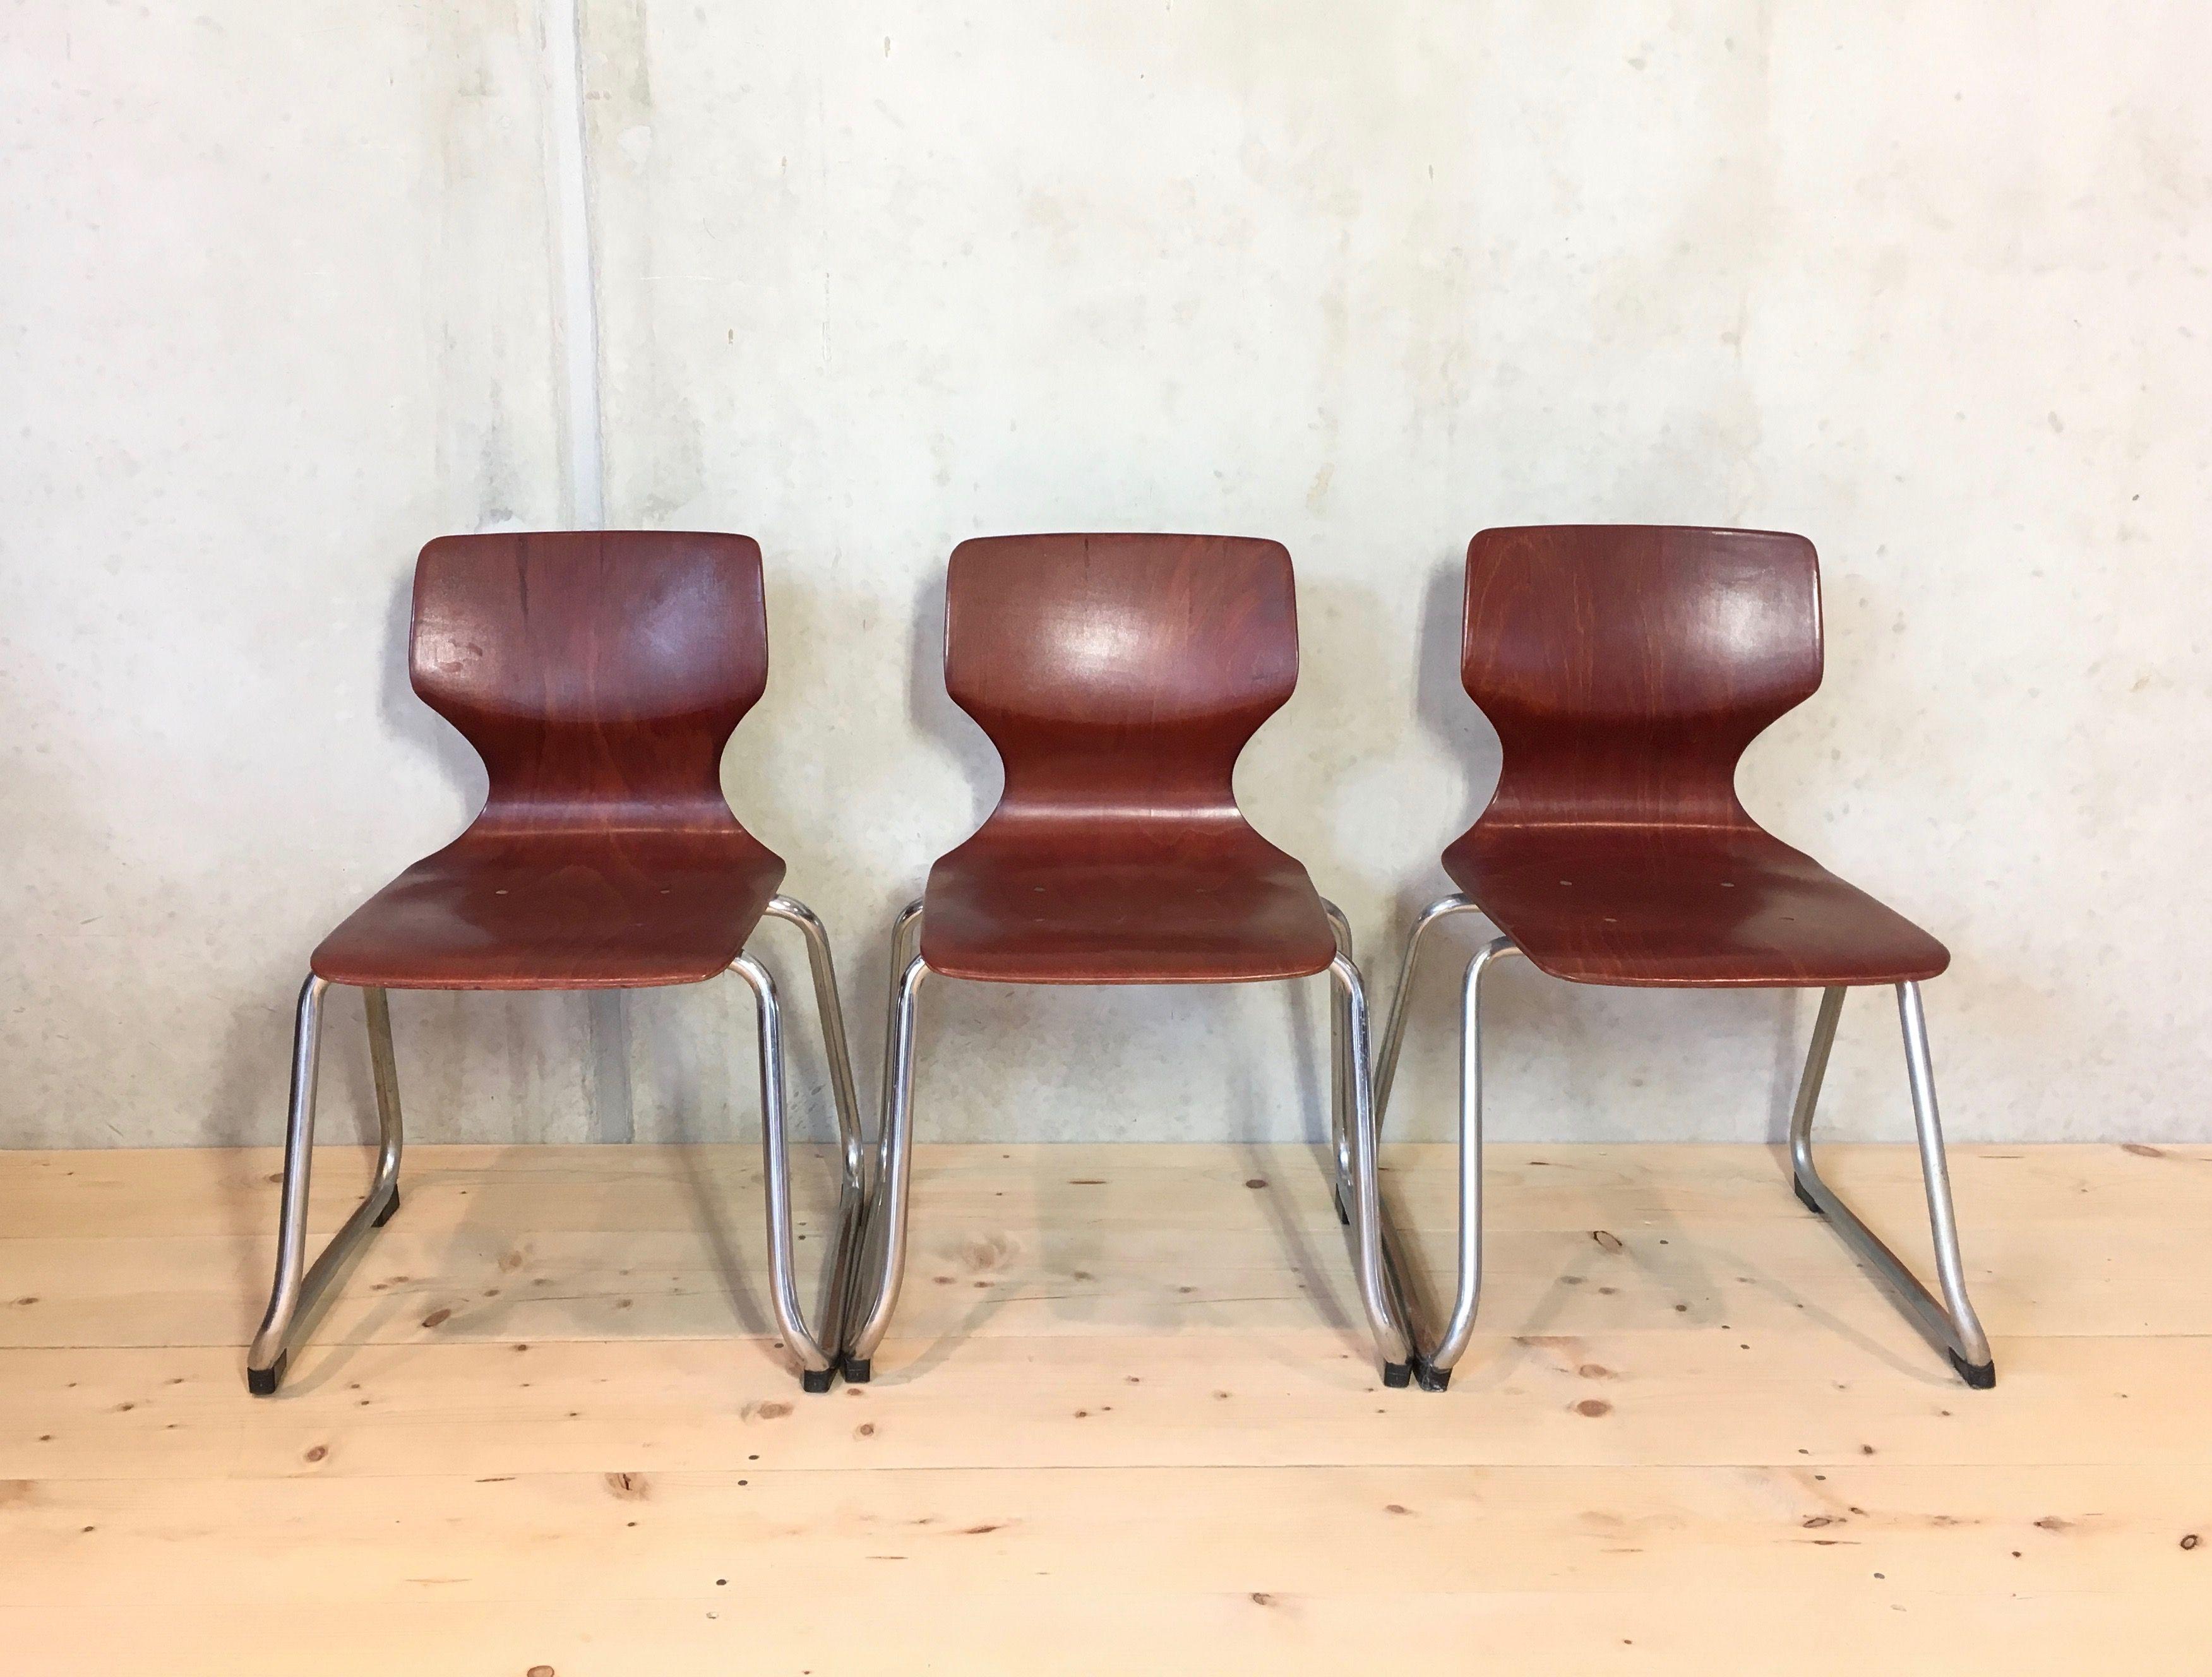 Frankfurter Küchenstuhl » 2 stühle frankfurter küchenstuhl stuhl ...